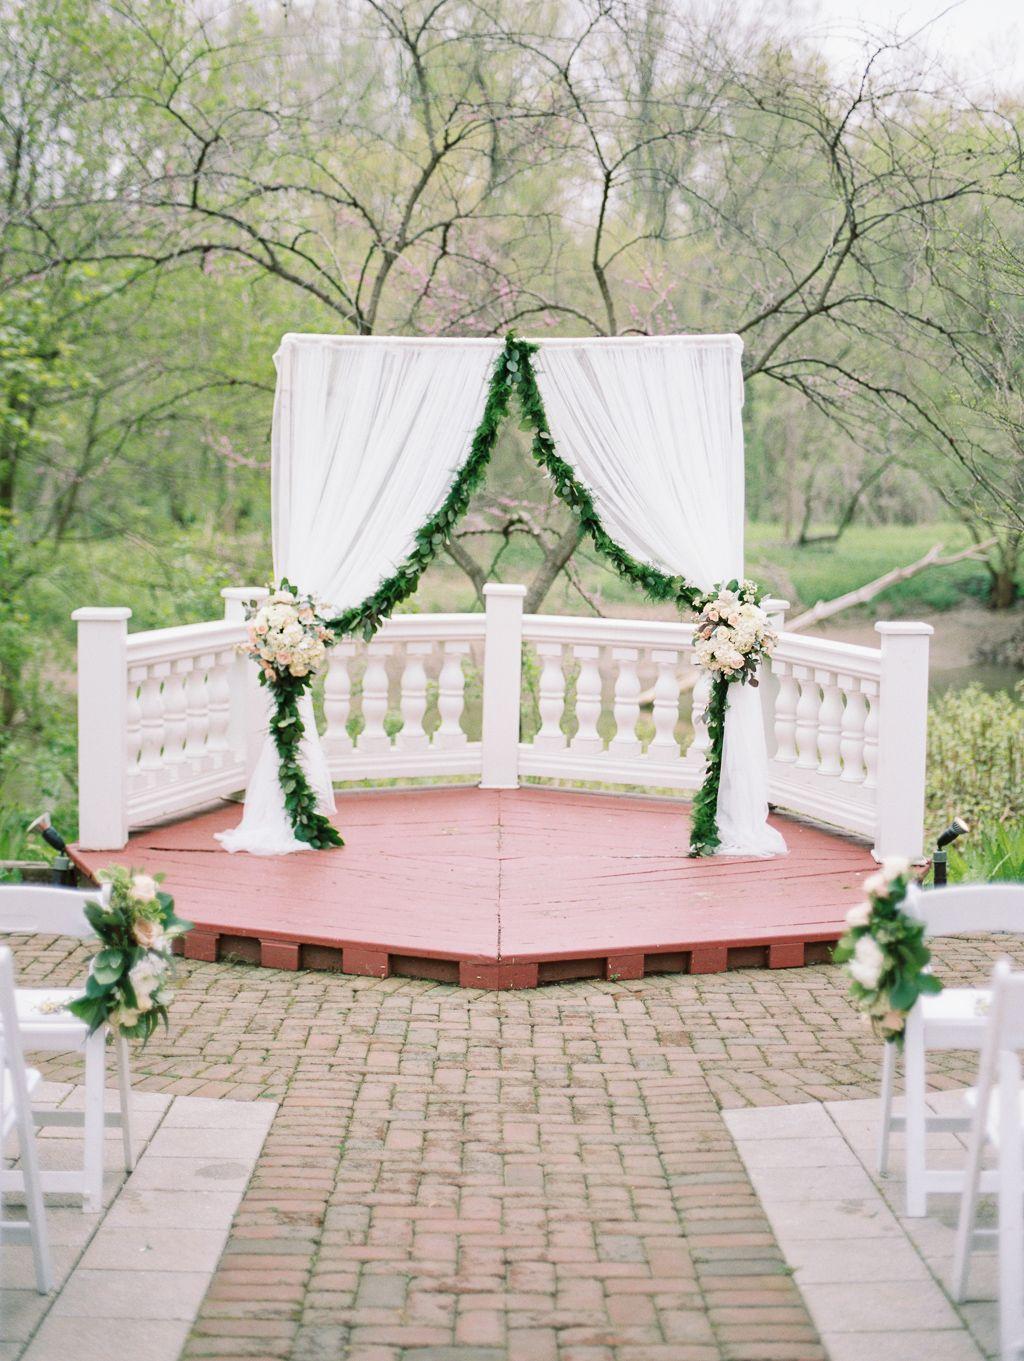 Weddings At The Elkridge Furnace Inn Maryland Wedding Venues Ceremony Backdrop Elkridge